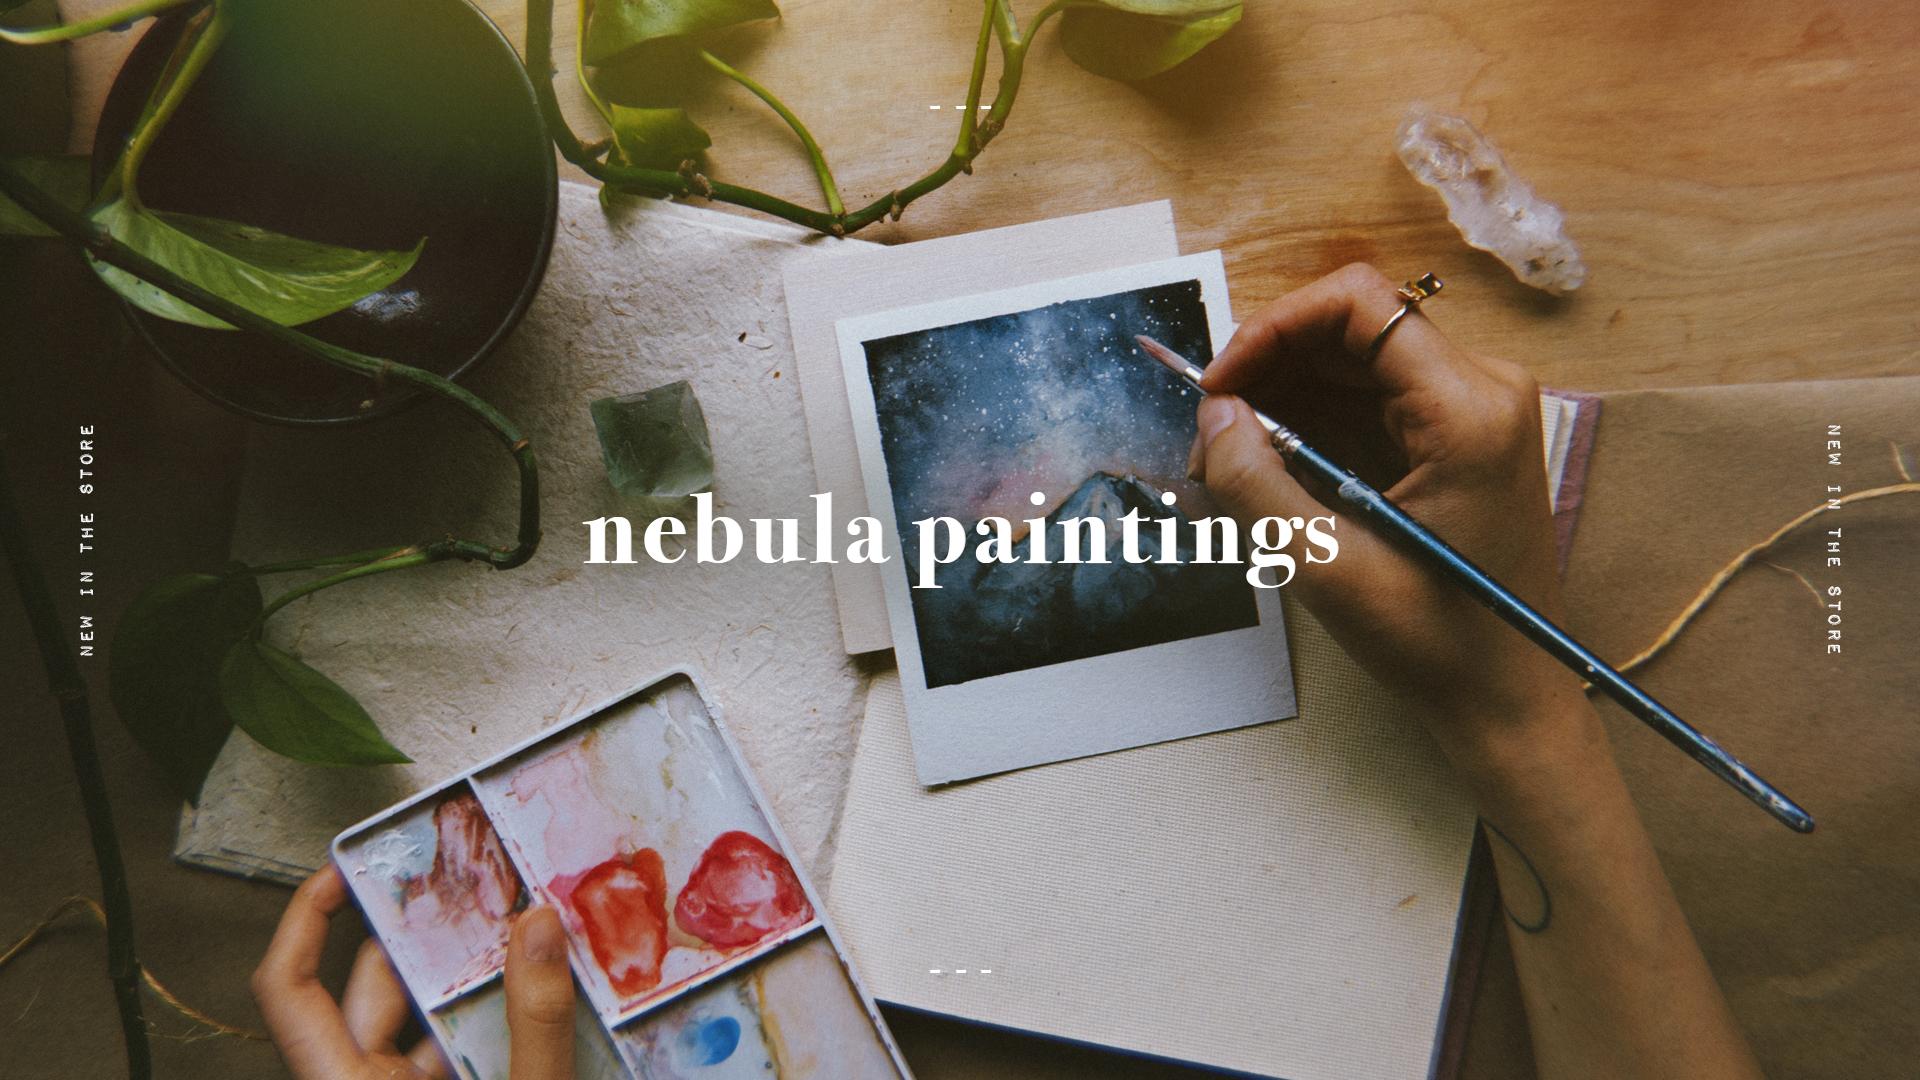 carousel-nebulapaintings.jpg